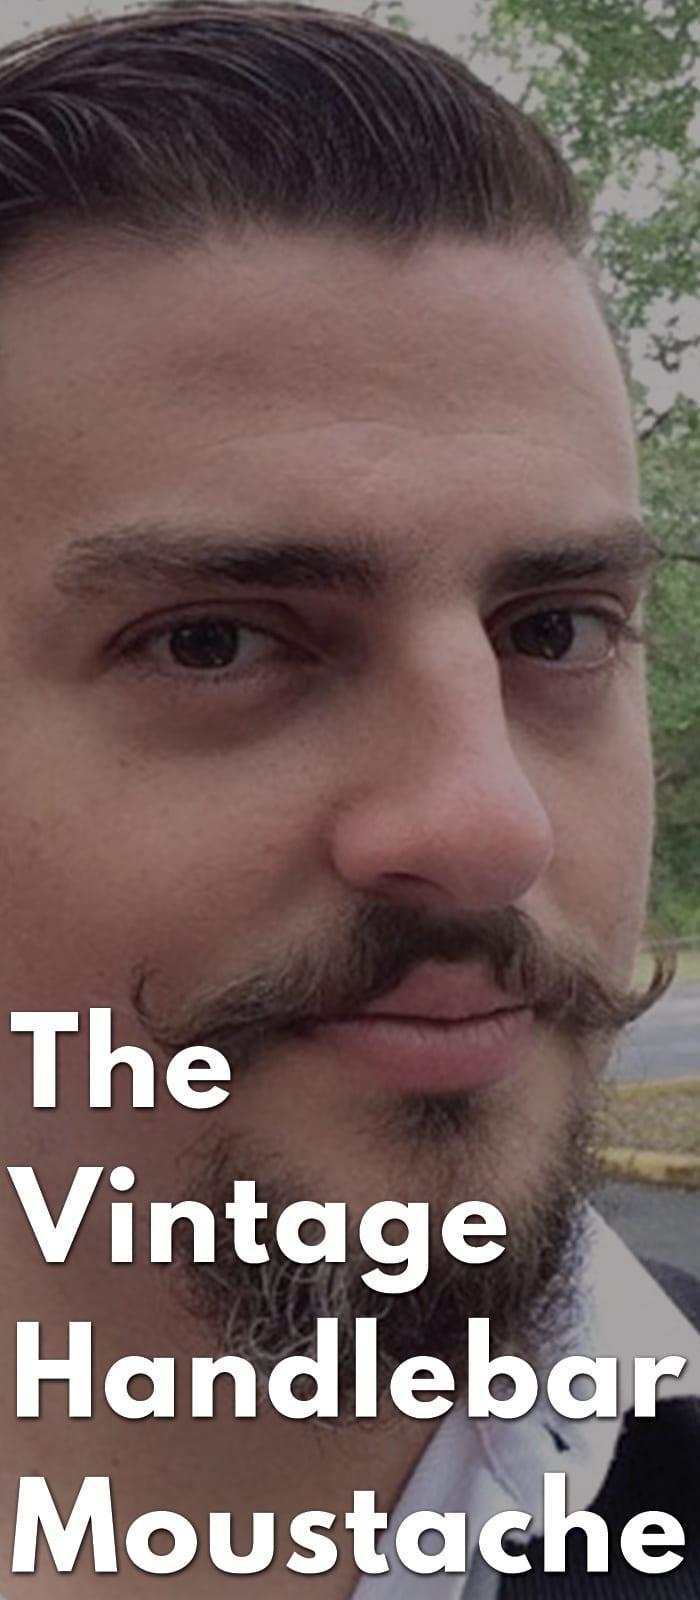 The-Vintage-Handlebar-Moustache.